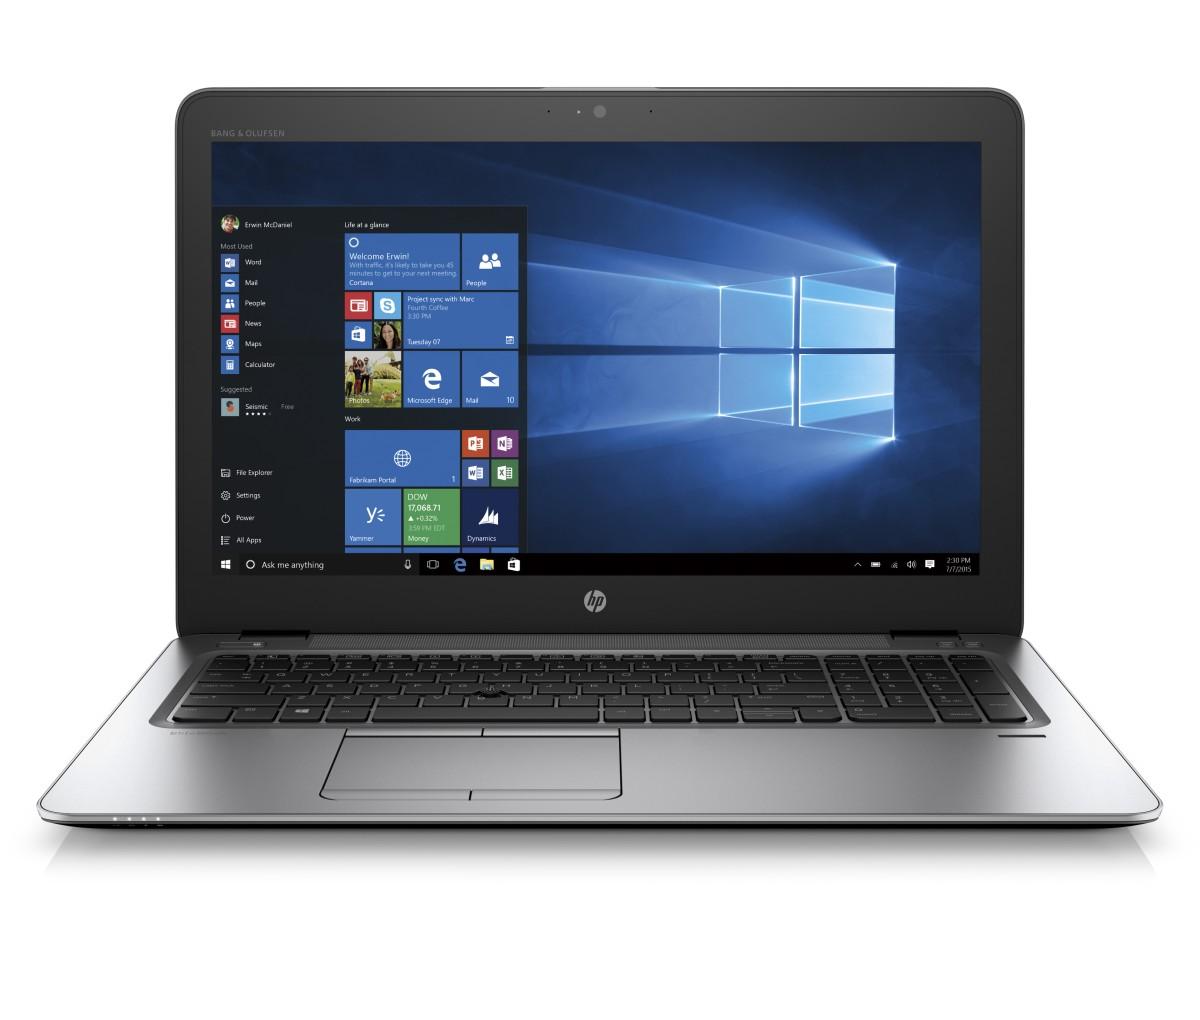 Obrázok produktu HP EliteBook 850 G4 15.6 FHD/ i7-7500U/ 16GB/ 512SSD/ ATI/ 4G/ WIFI/ BT/ MCR/ FPR/ 3RServis/ W10P